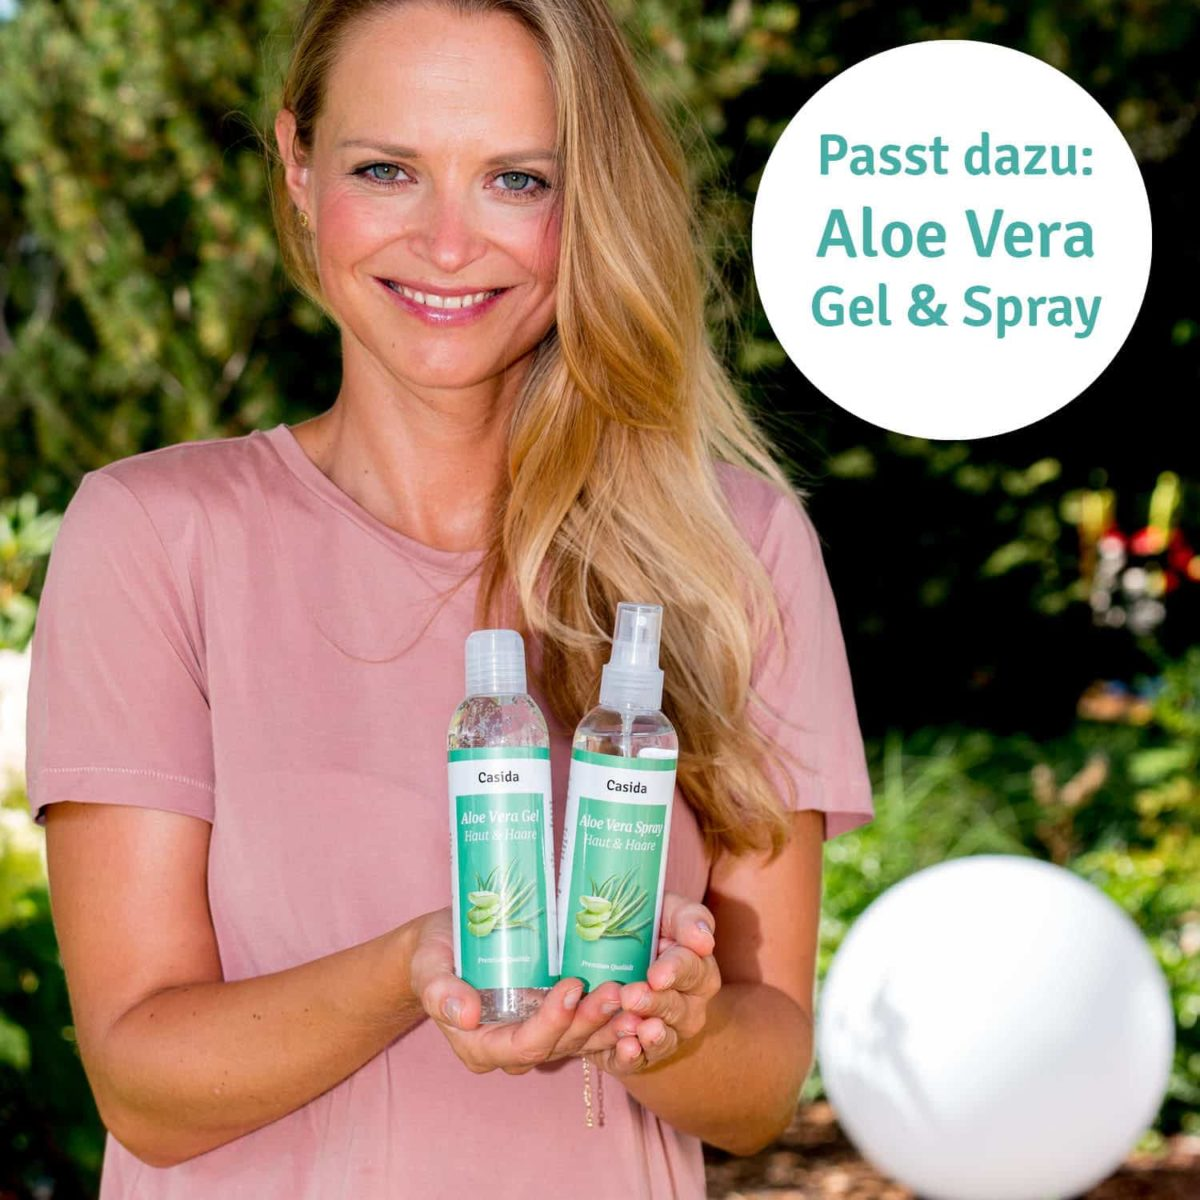 Casida Hyaluronic Acid Lift Cream with Aloe Vera 50 ml 16813082 PZN Apotheke Sommercreme Hyaluronsäure nicht-komedogen8